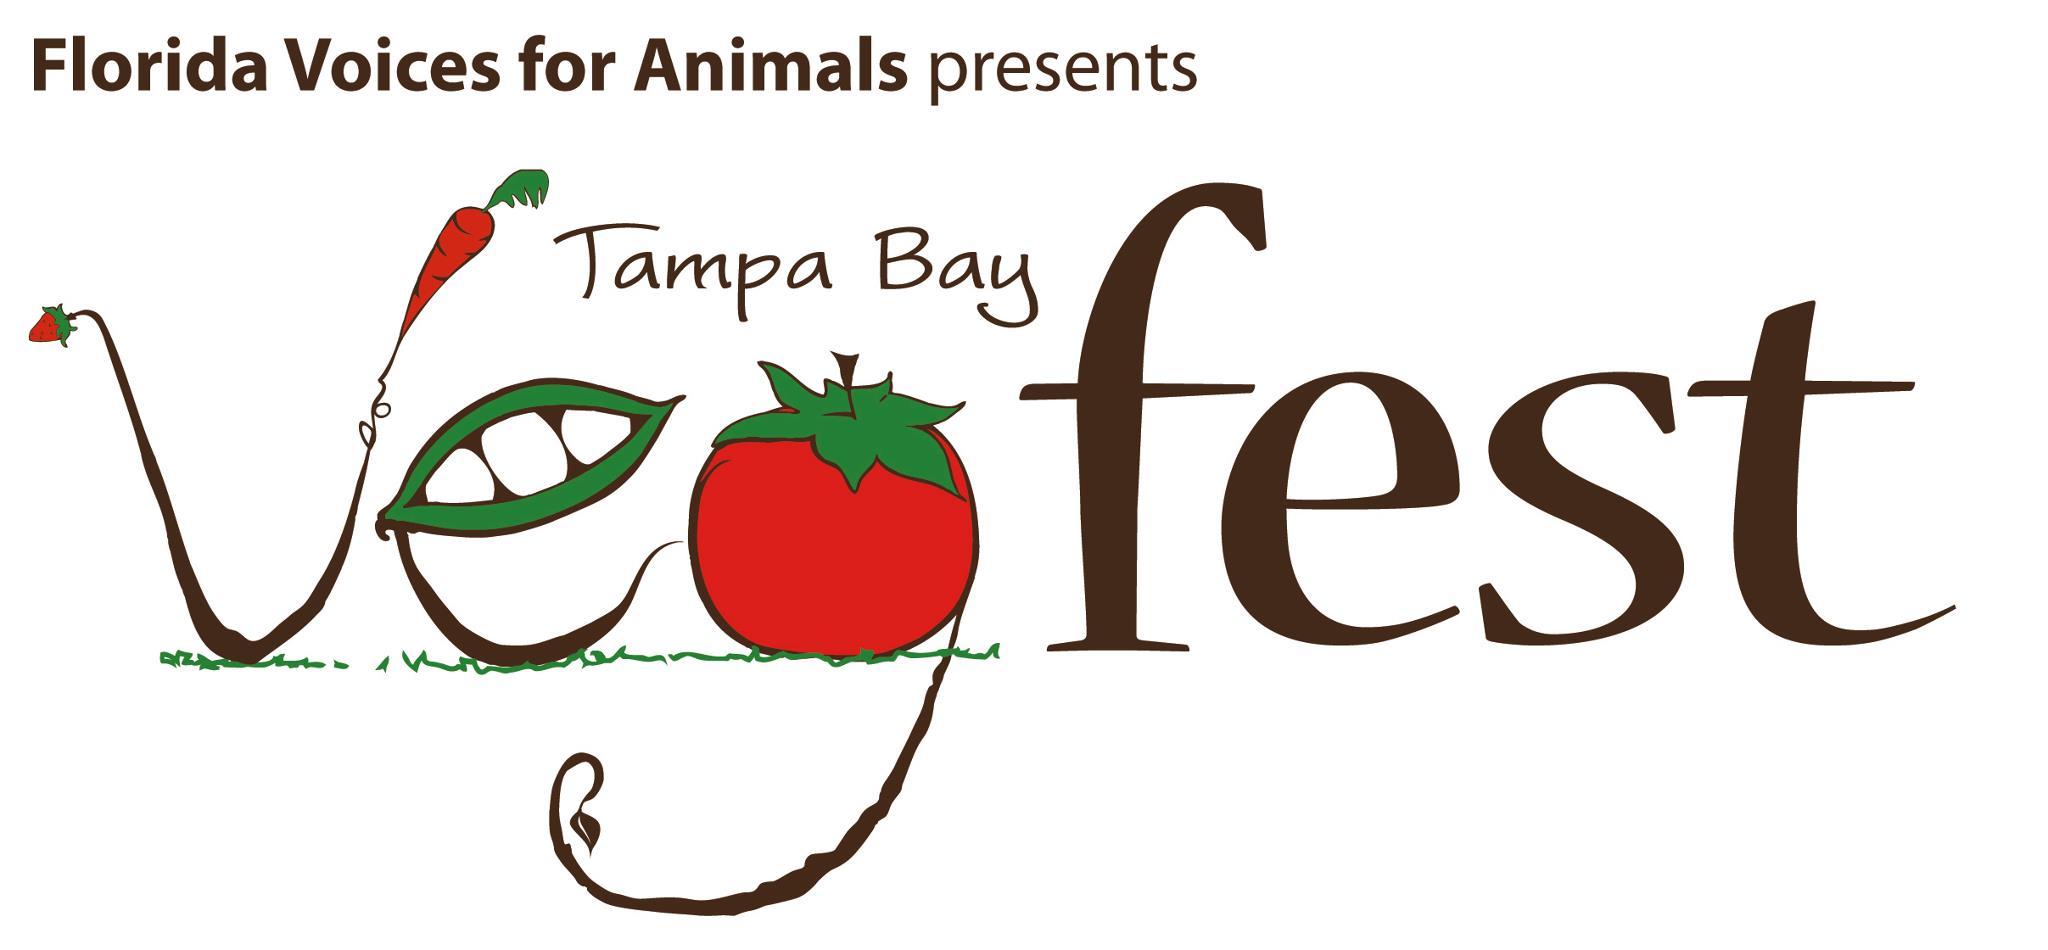 Tampa Bay Veg Fest 2018